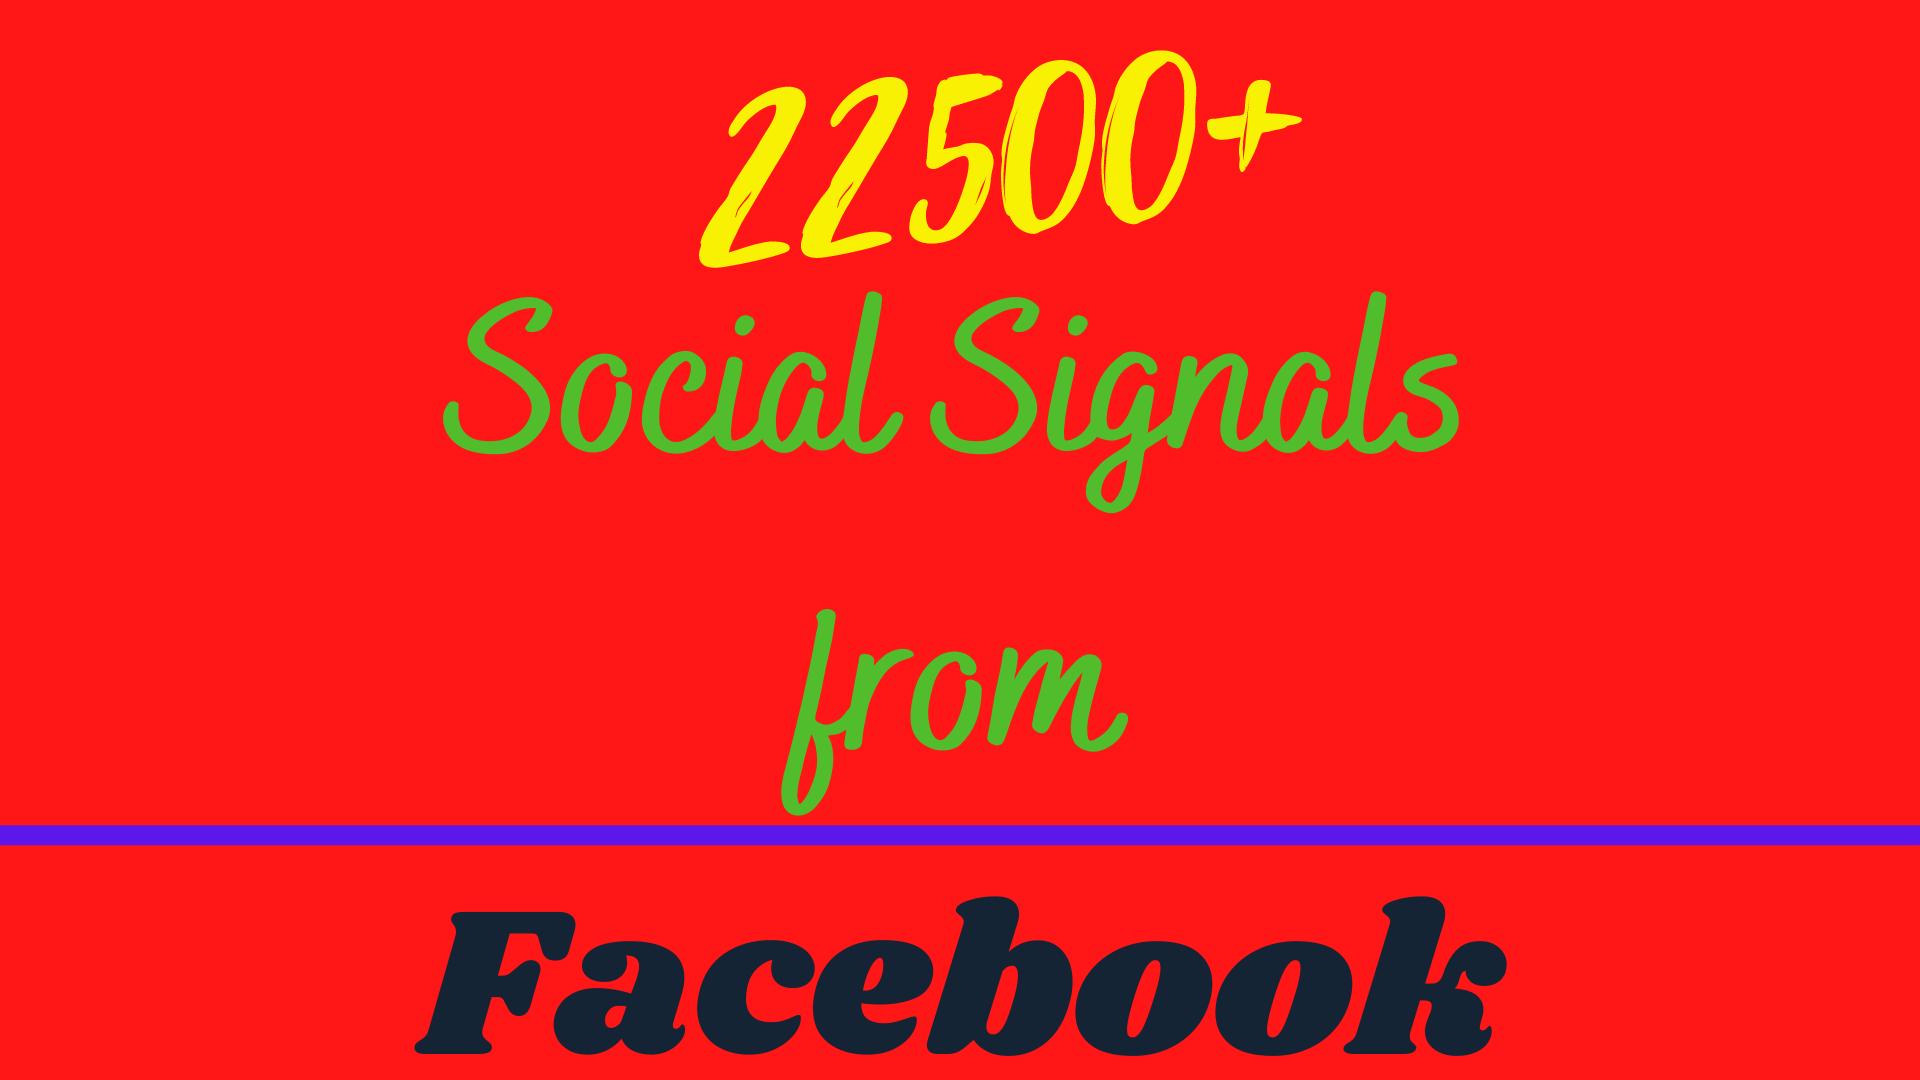 I will provide 22500+ Social Signals